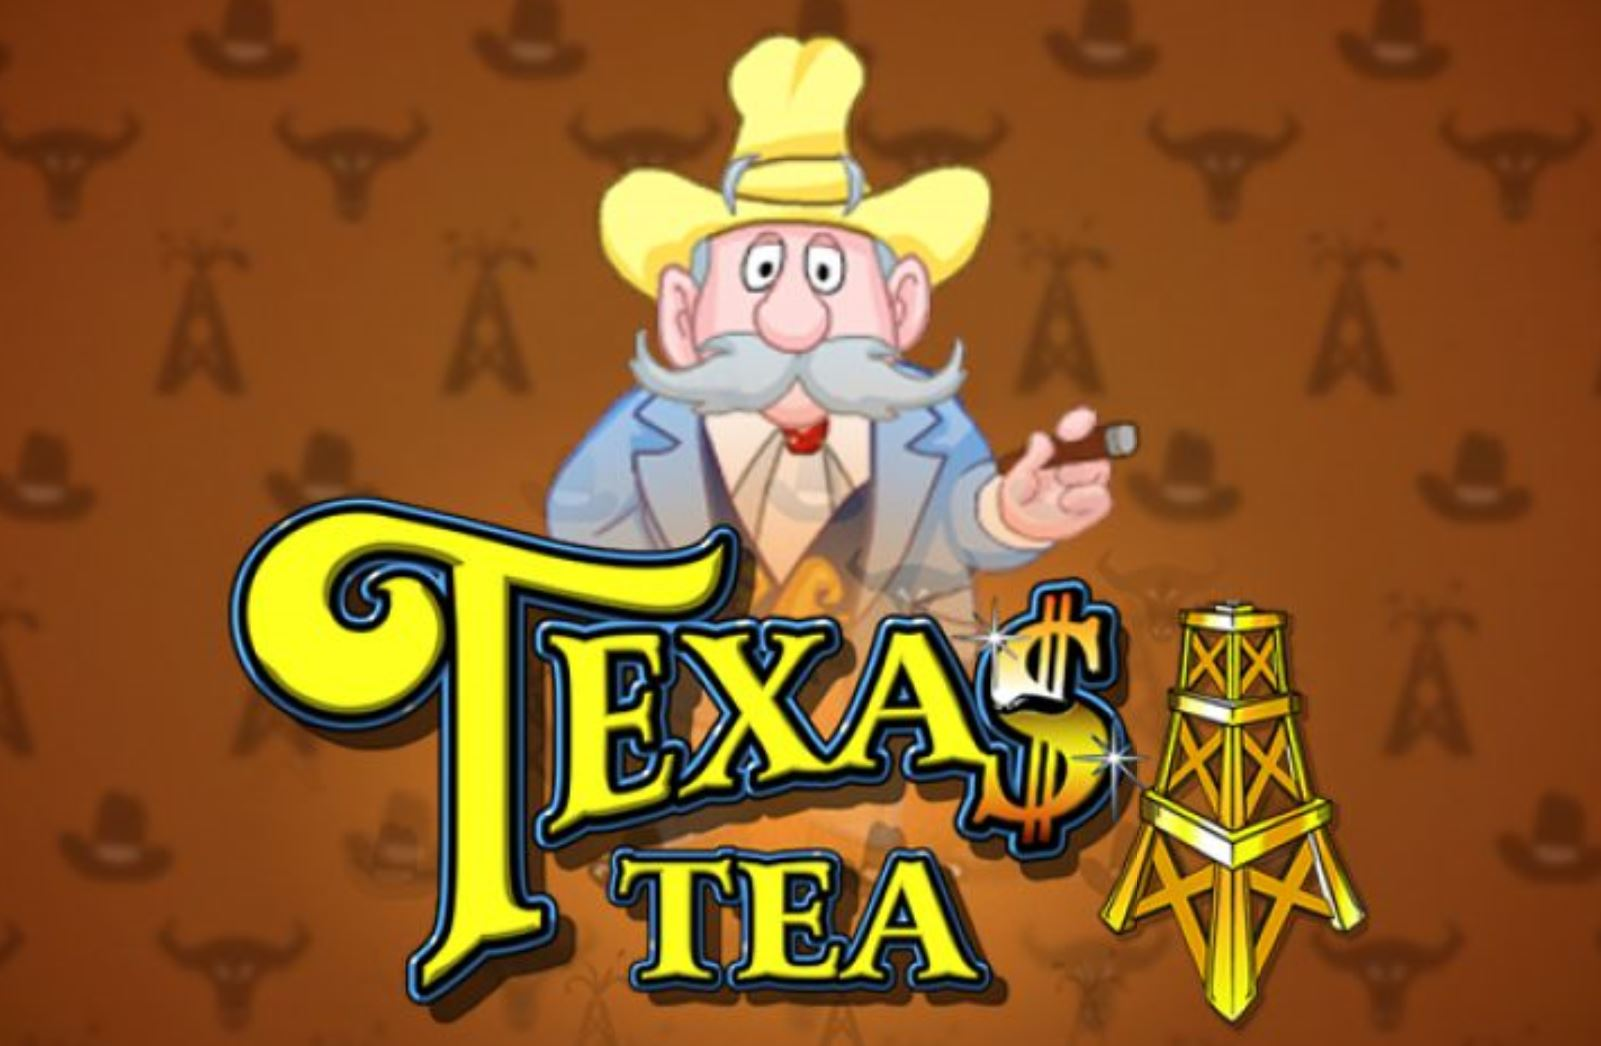 A Texas Tea Slots Machine Enjoys Great Rewards